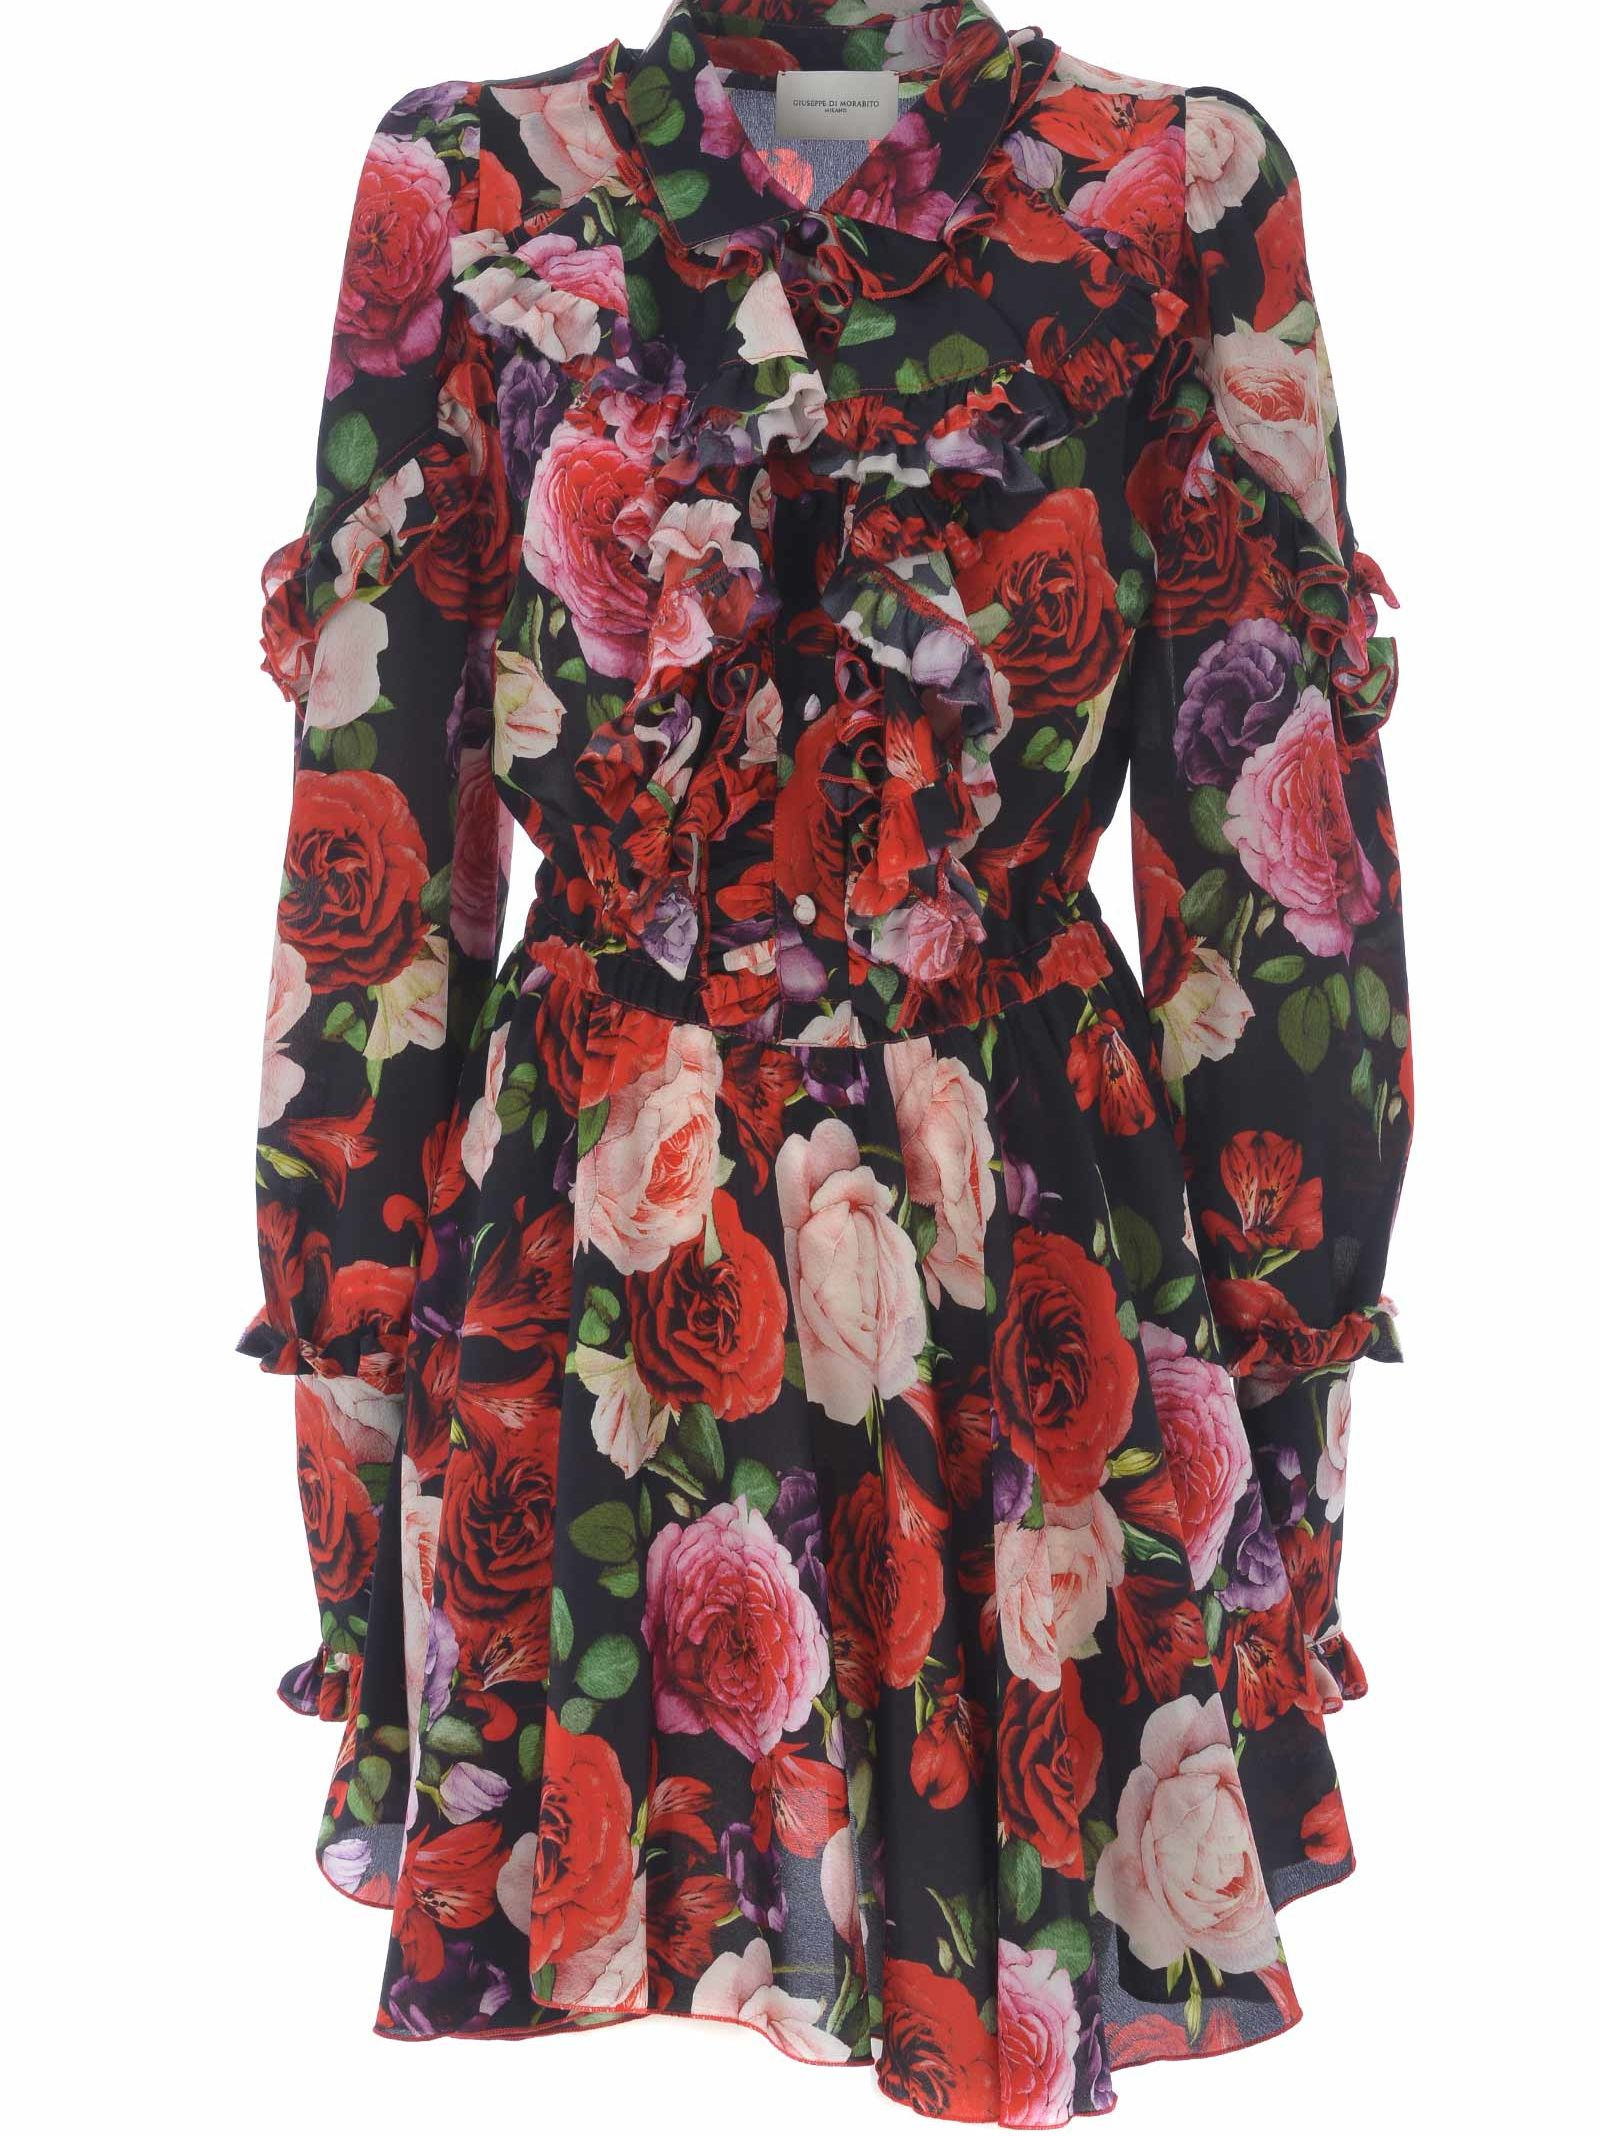 GIUSEPPE DI MORABITO Giuseppe Di Morabito Floral Flared Dress in Nero-Rosso